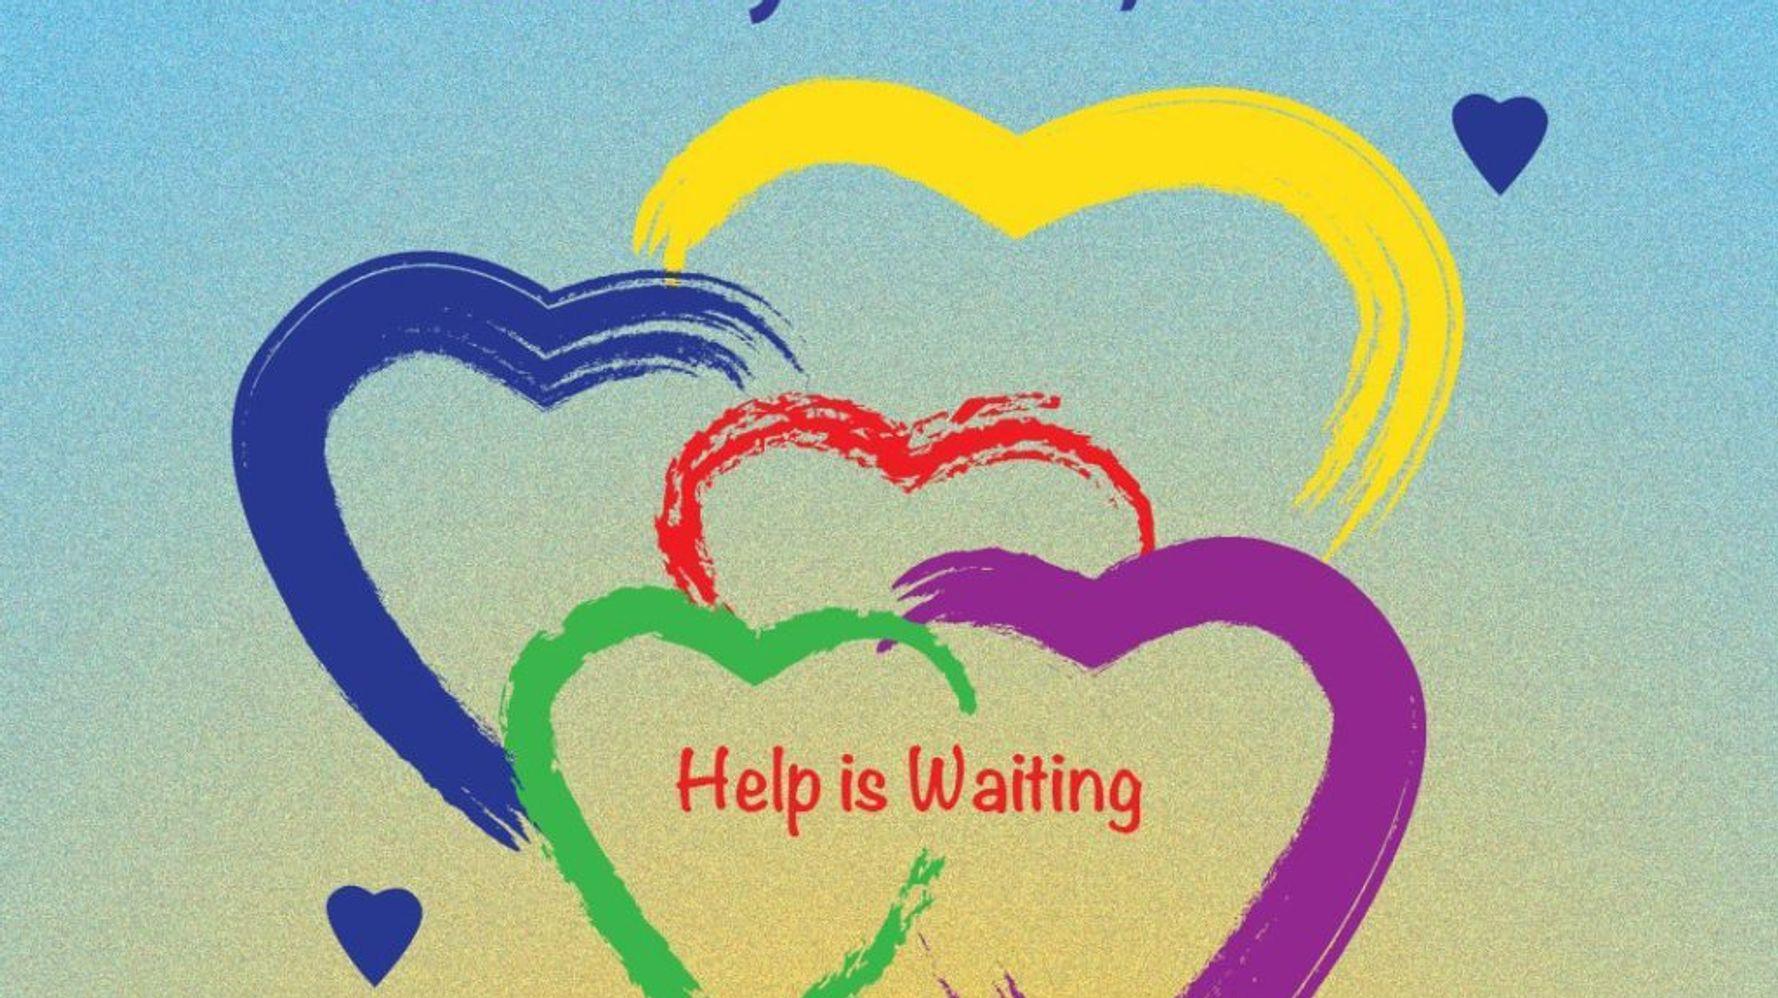 It's COA Awareness Week: So Let's Look Into What Happens to